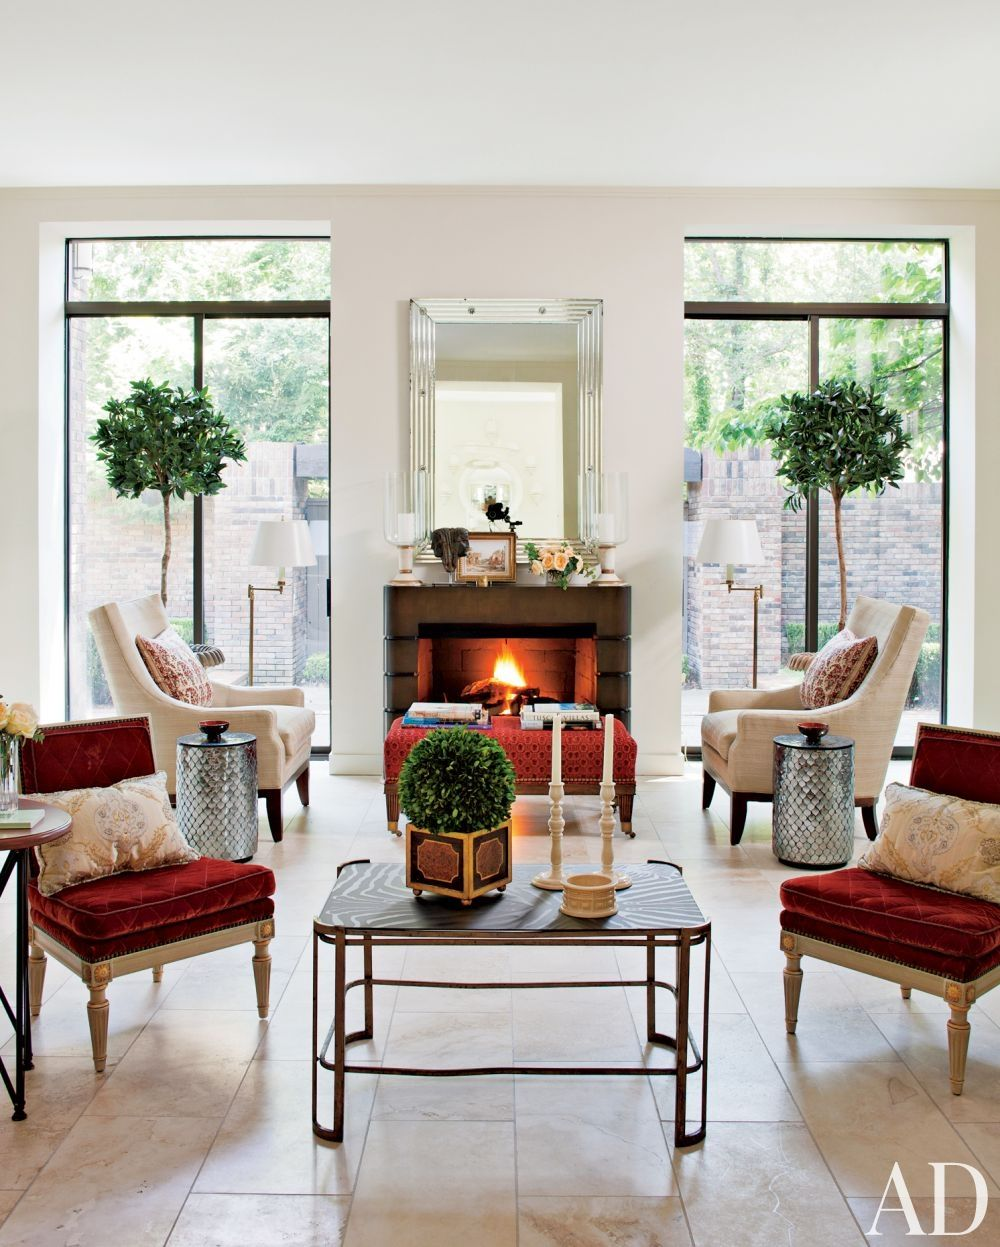 Betterdecoratingbible: Plaster-walls-traditional-living-room-david-easton-inc